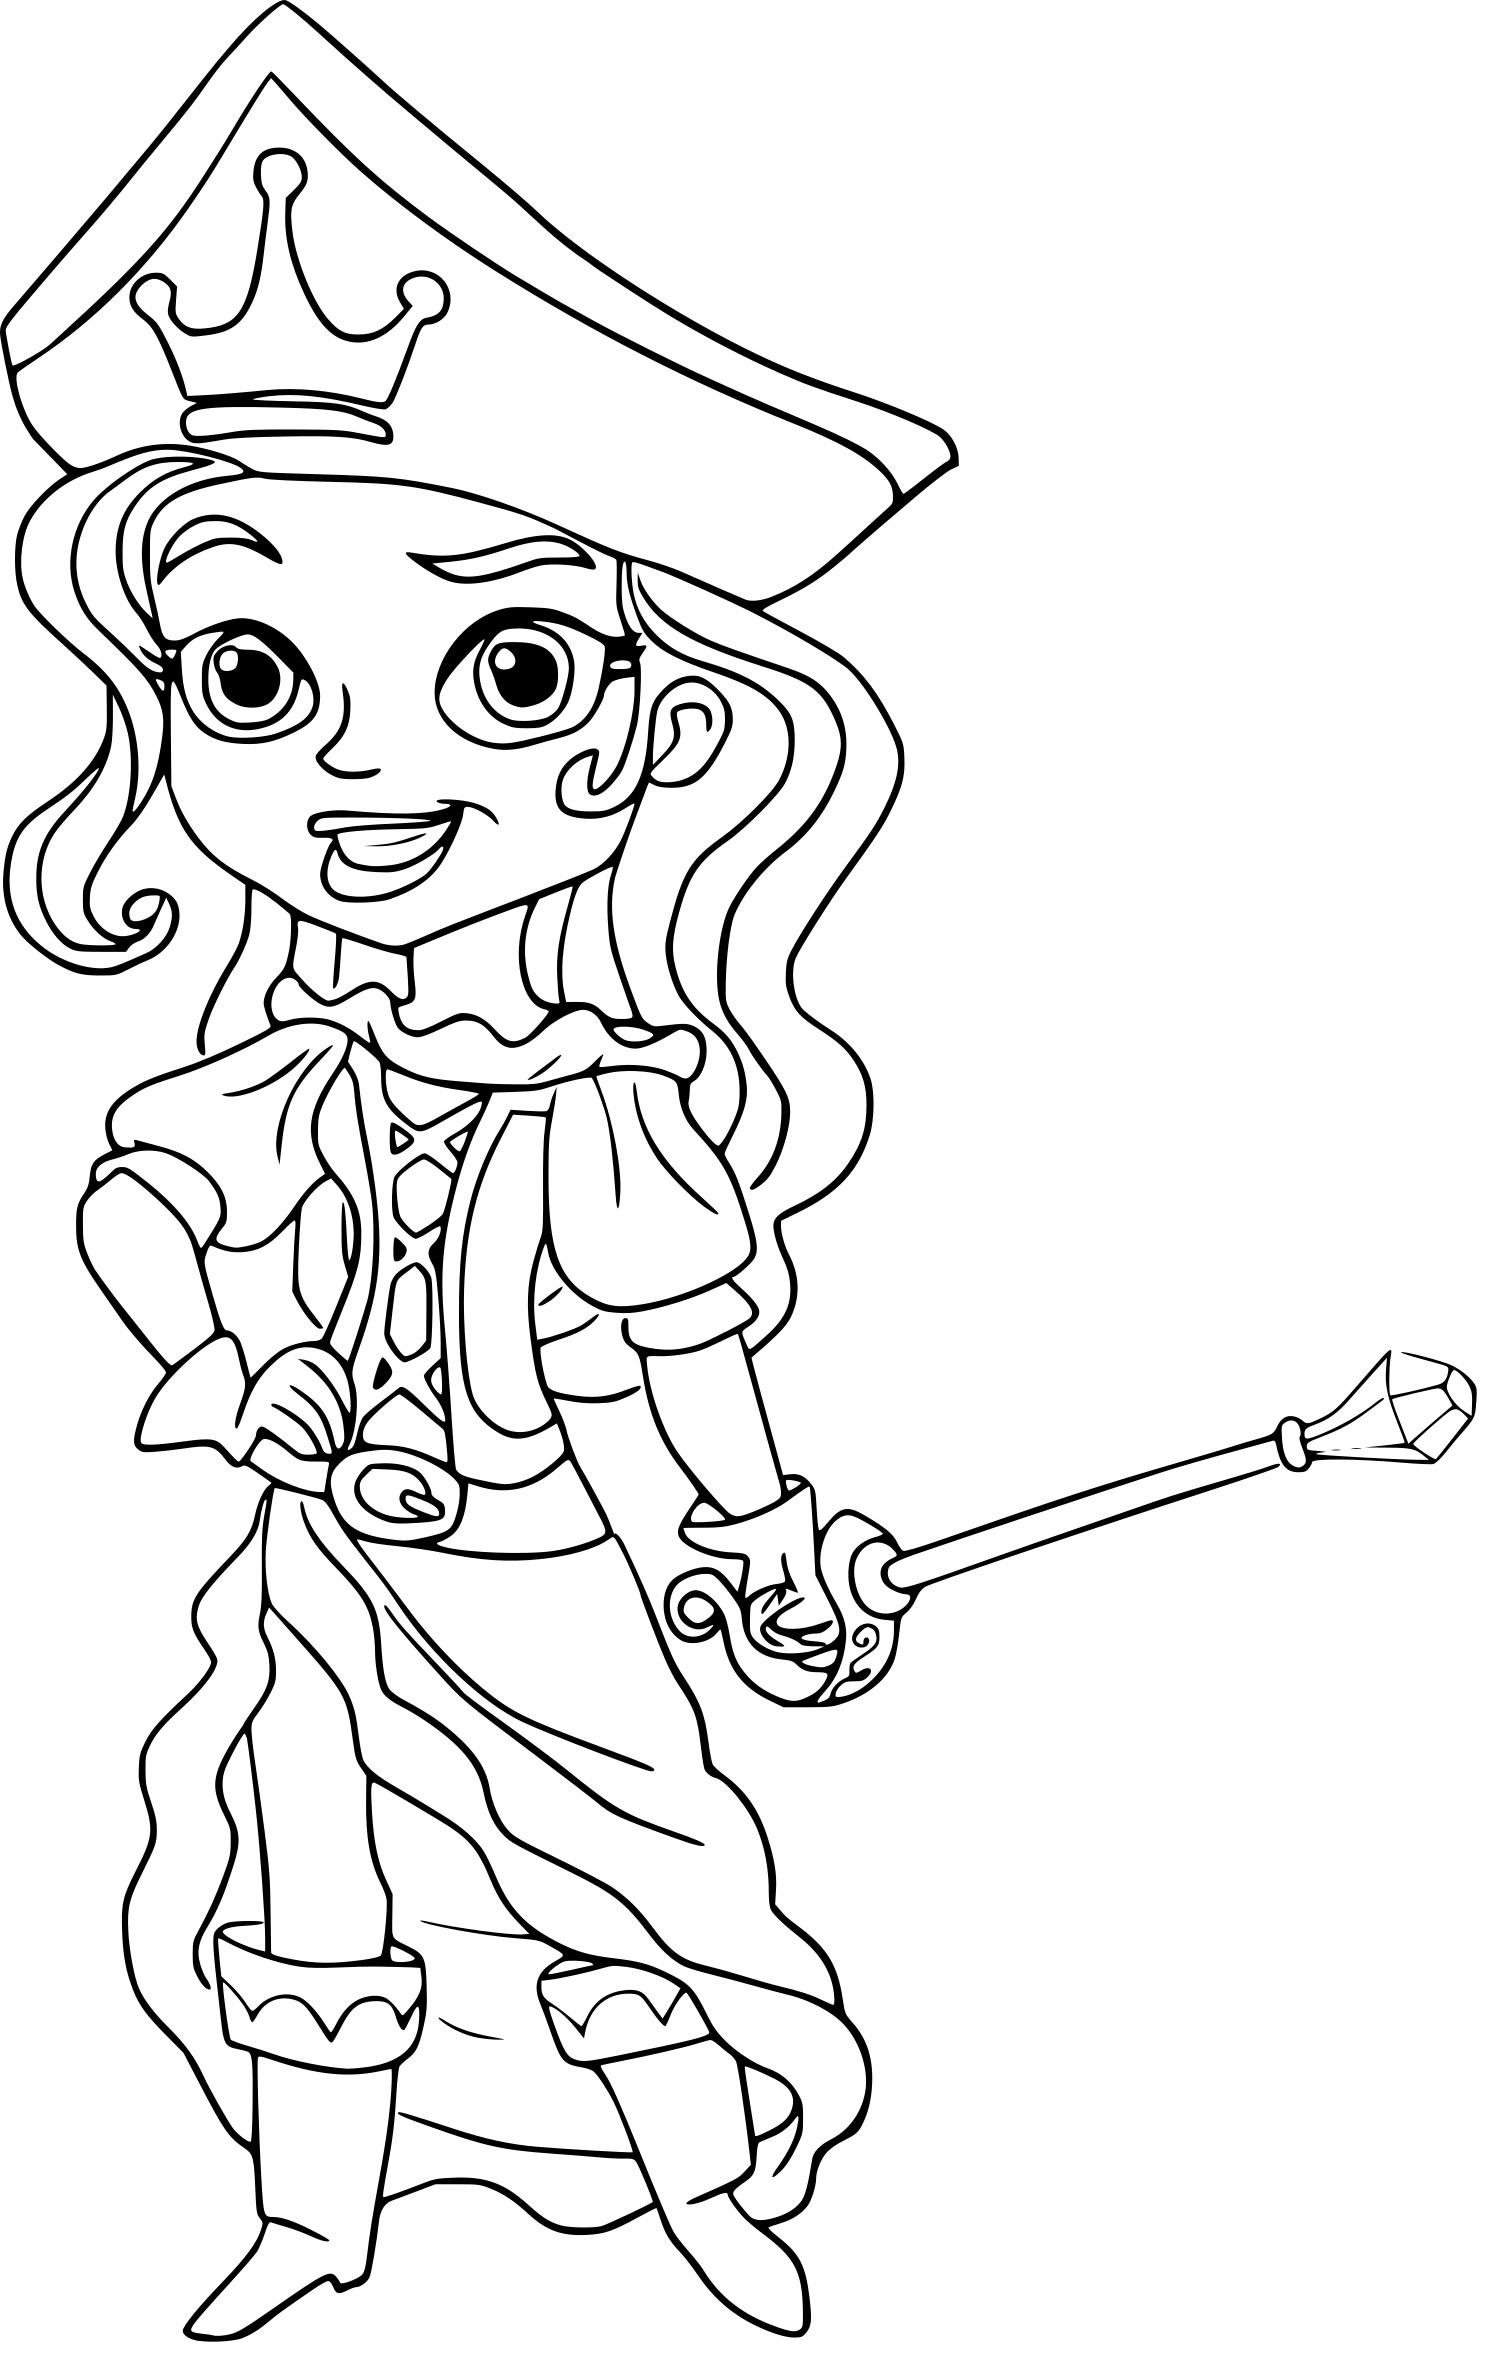 Coloriage Princesse Pirate À Imprimer serapportantà Dessin De Princesse À Colorier